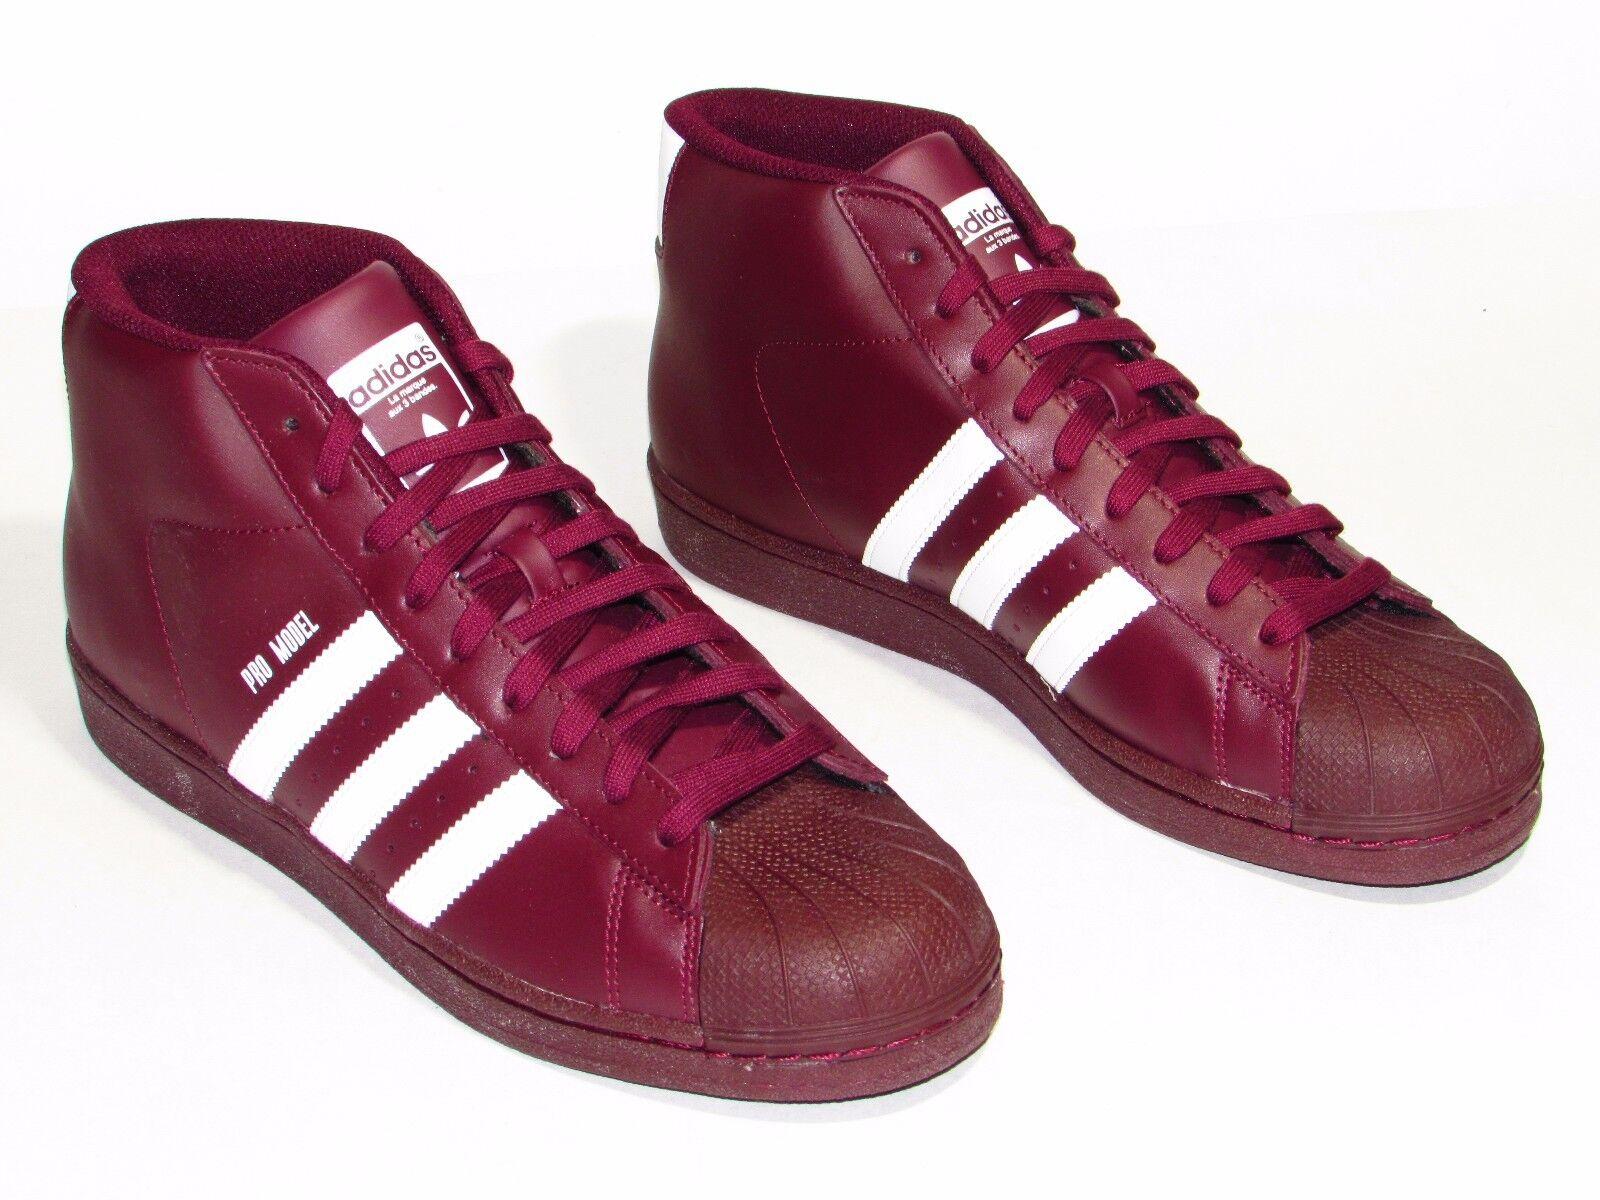 Adidas Pro Model Mens Casual Shoes Maroon B39370 Comfortable